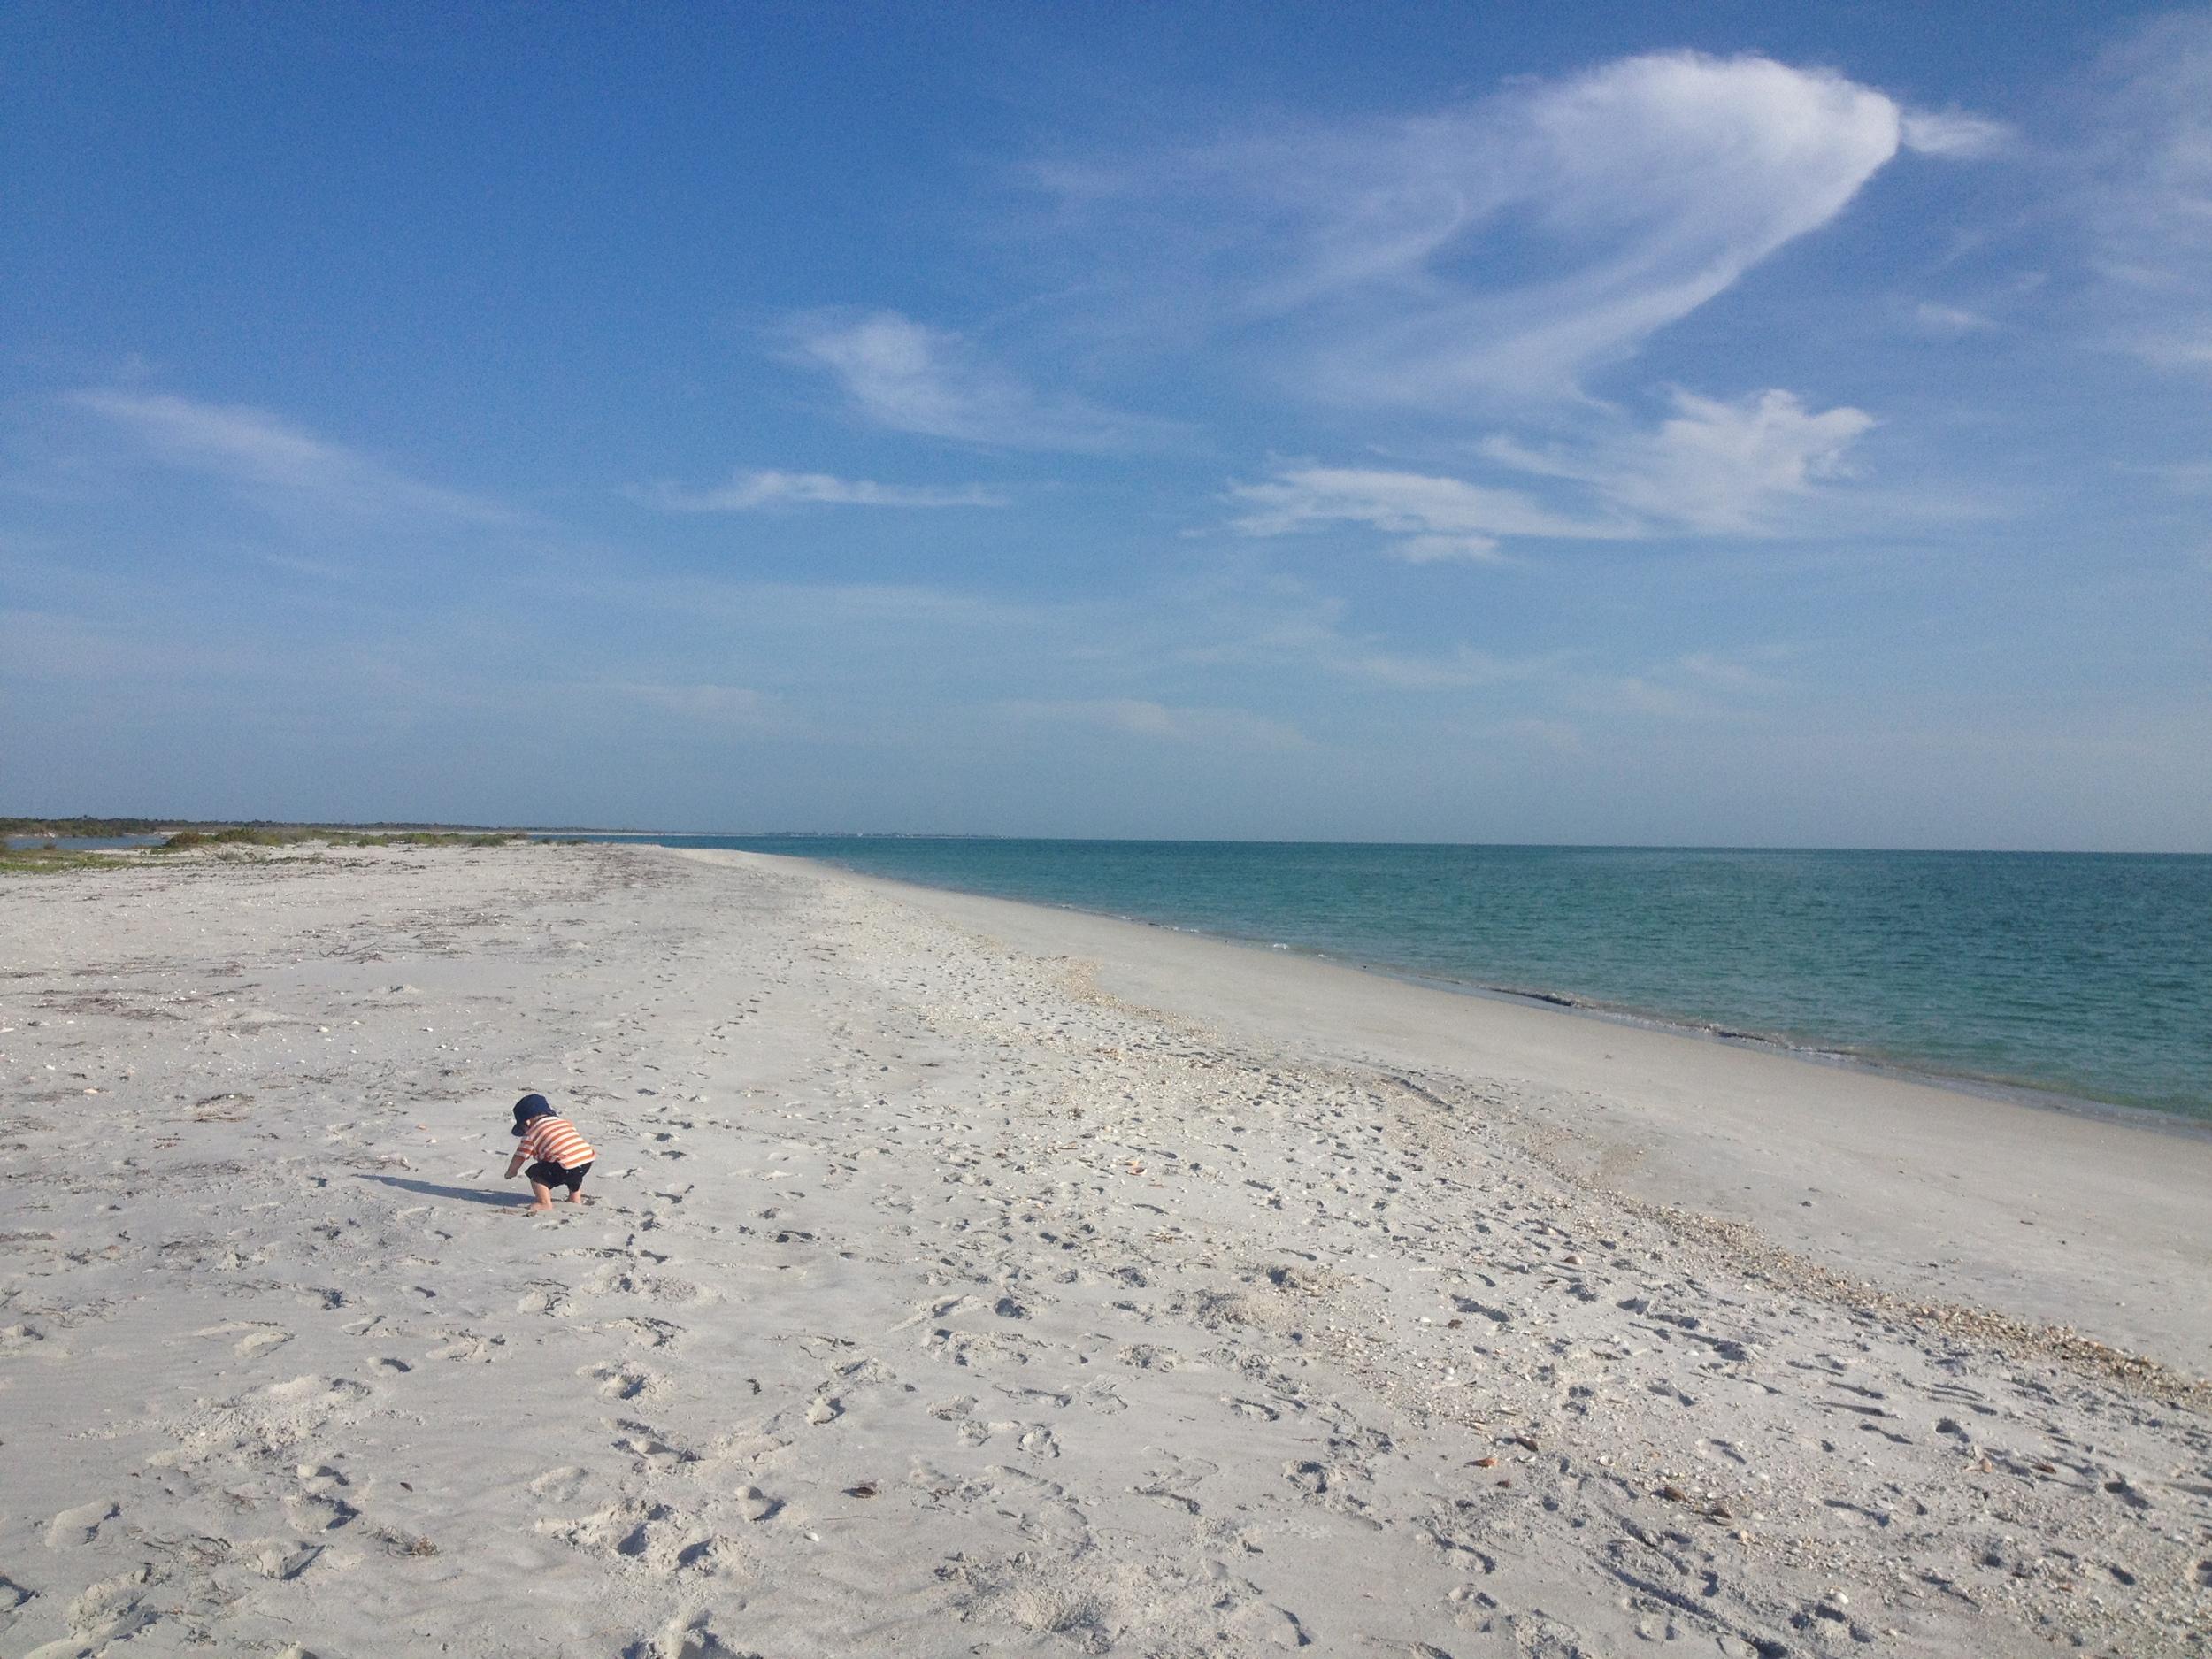 The beach at Cayo Costa